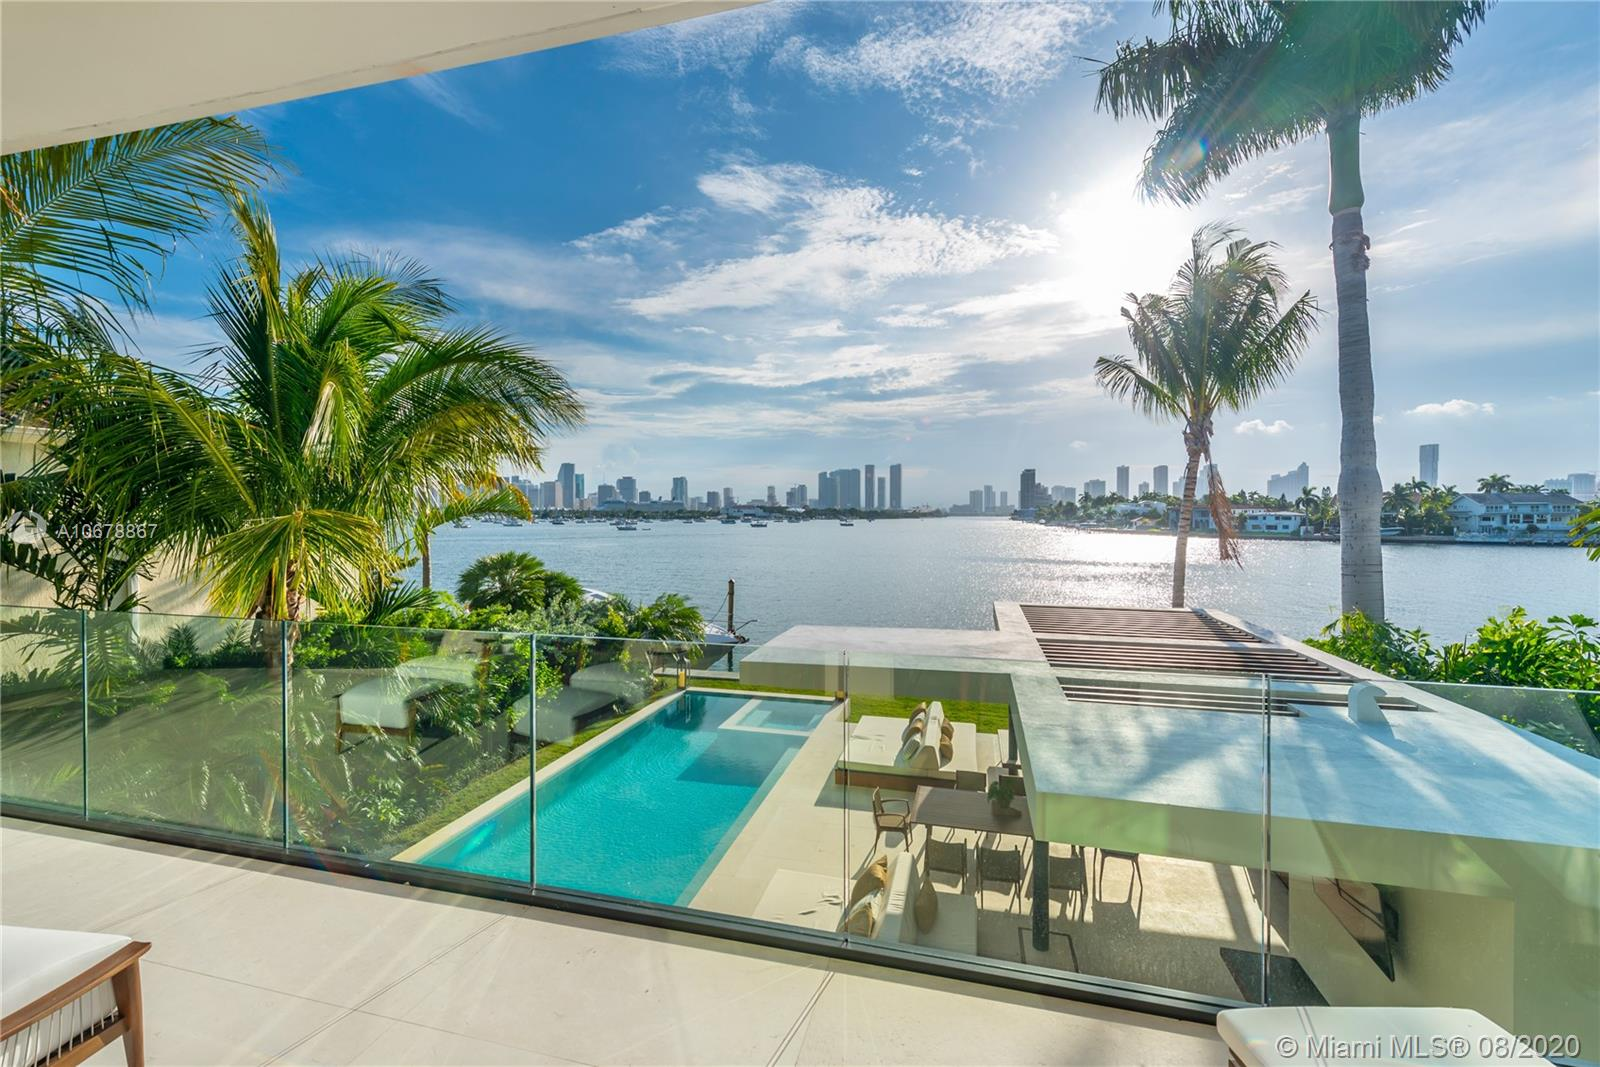 100 W San Marino Dr, Miami Beach, FL 33139